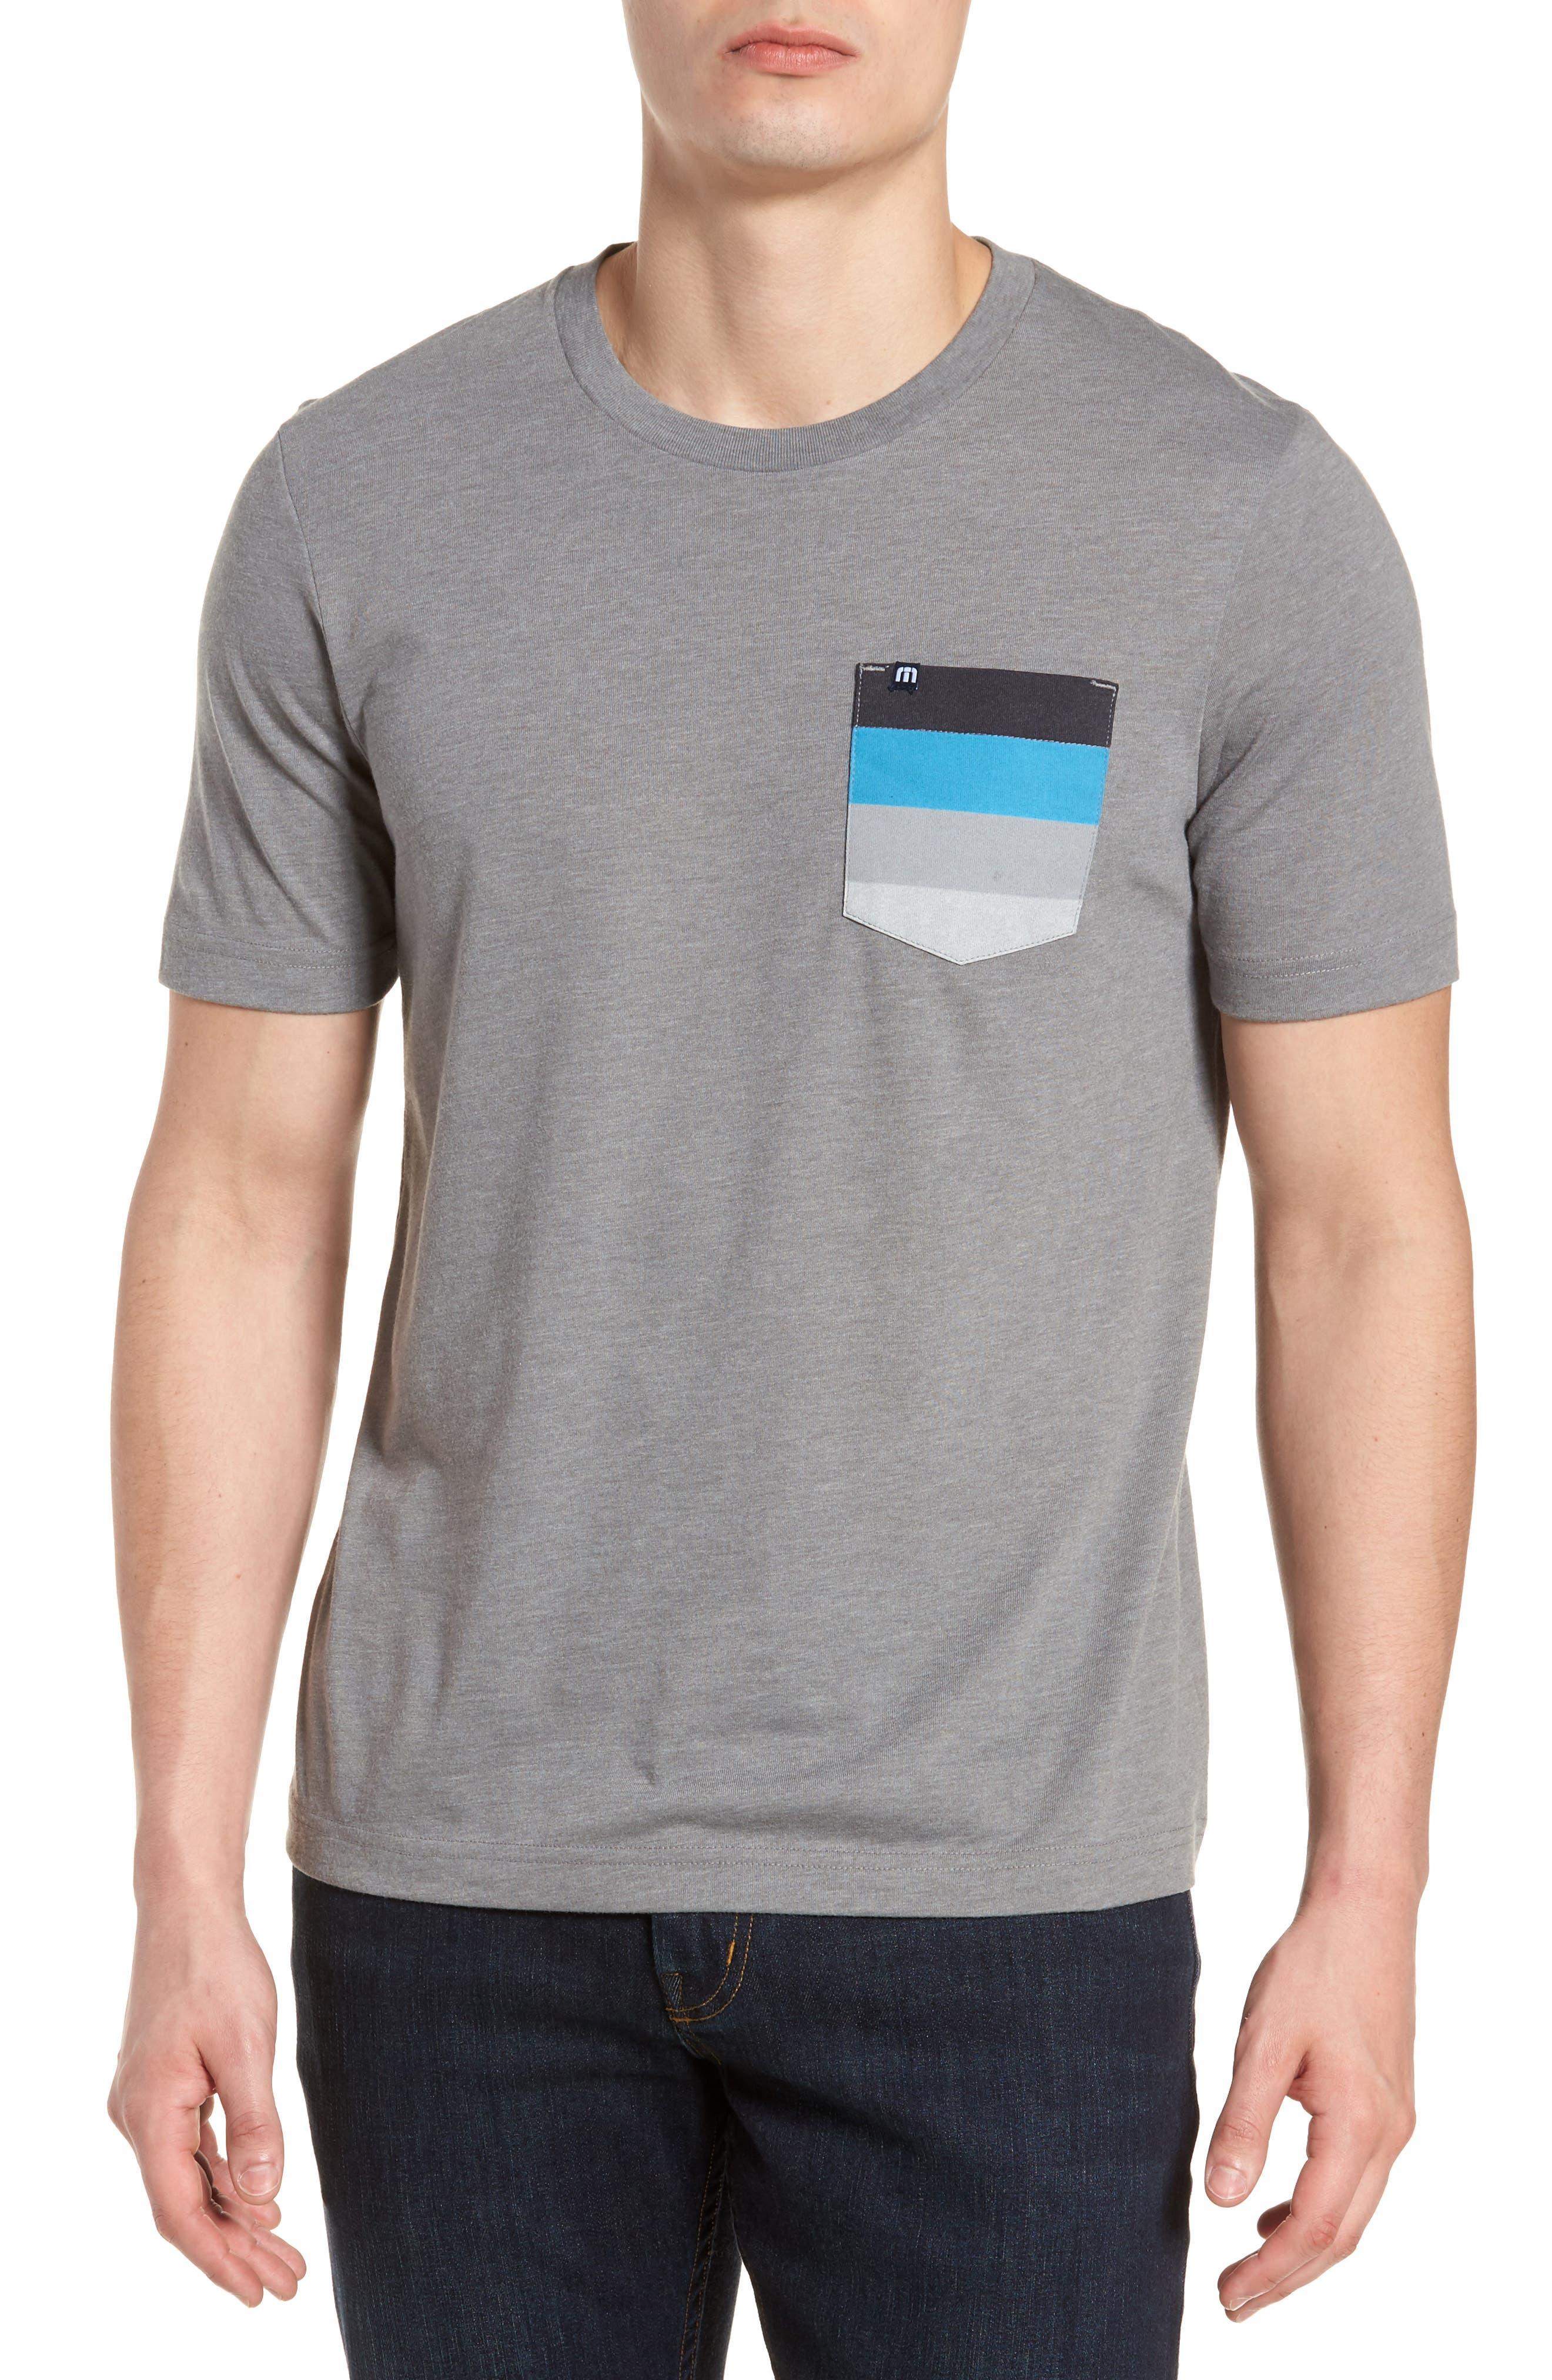 Chappy Doo Pocket T-Shirt,                         Main,                         color, Heather Grey